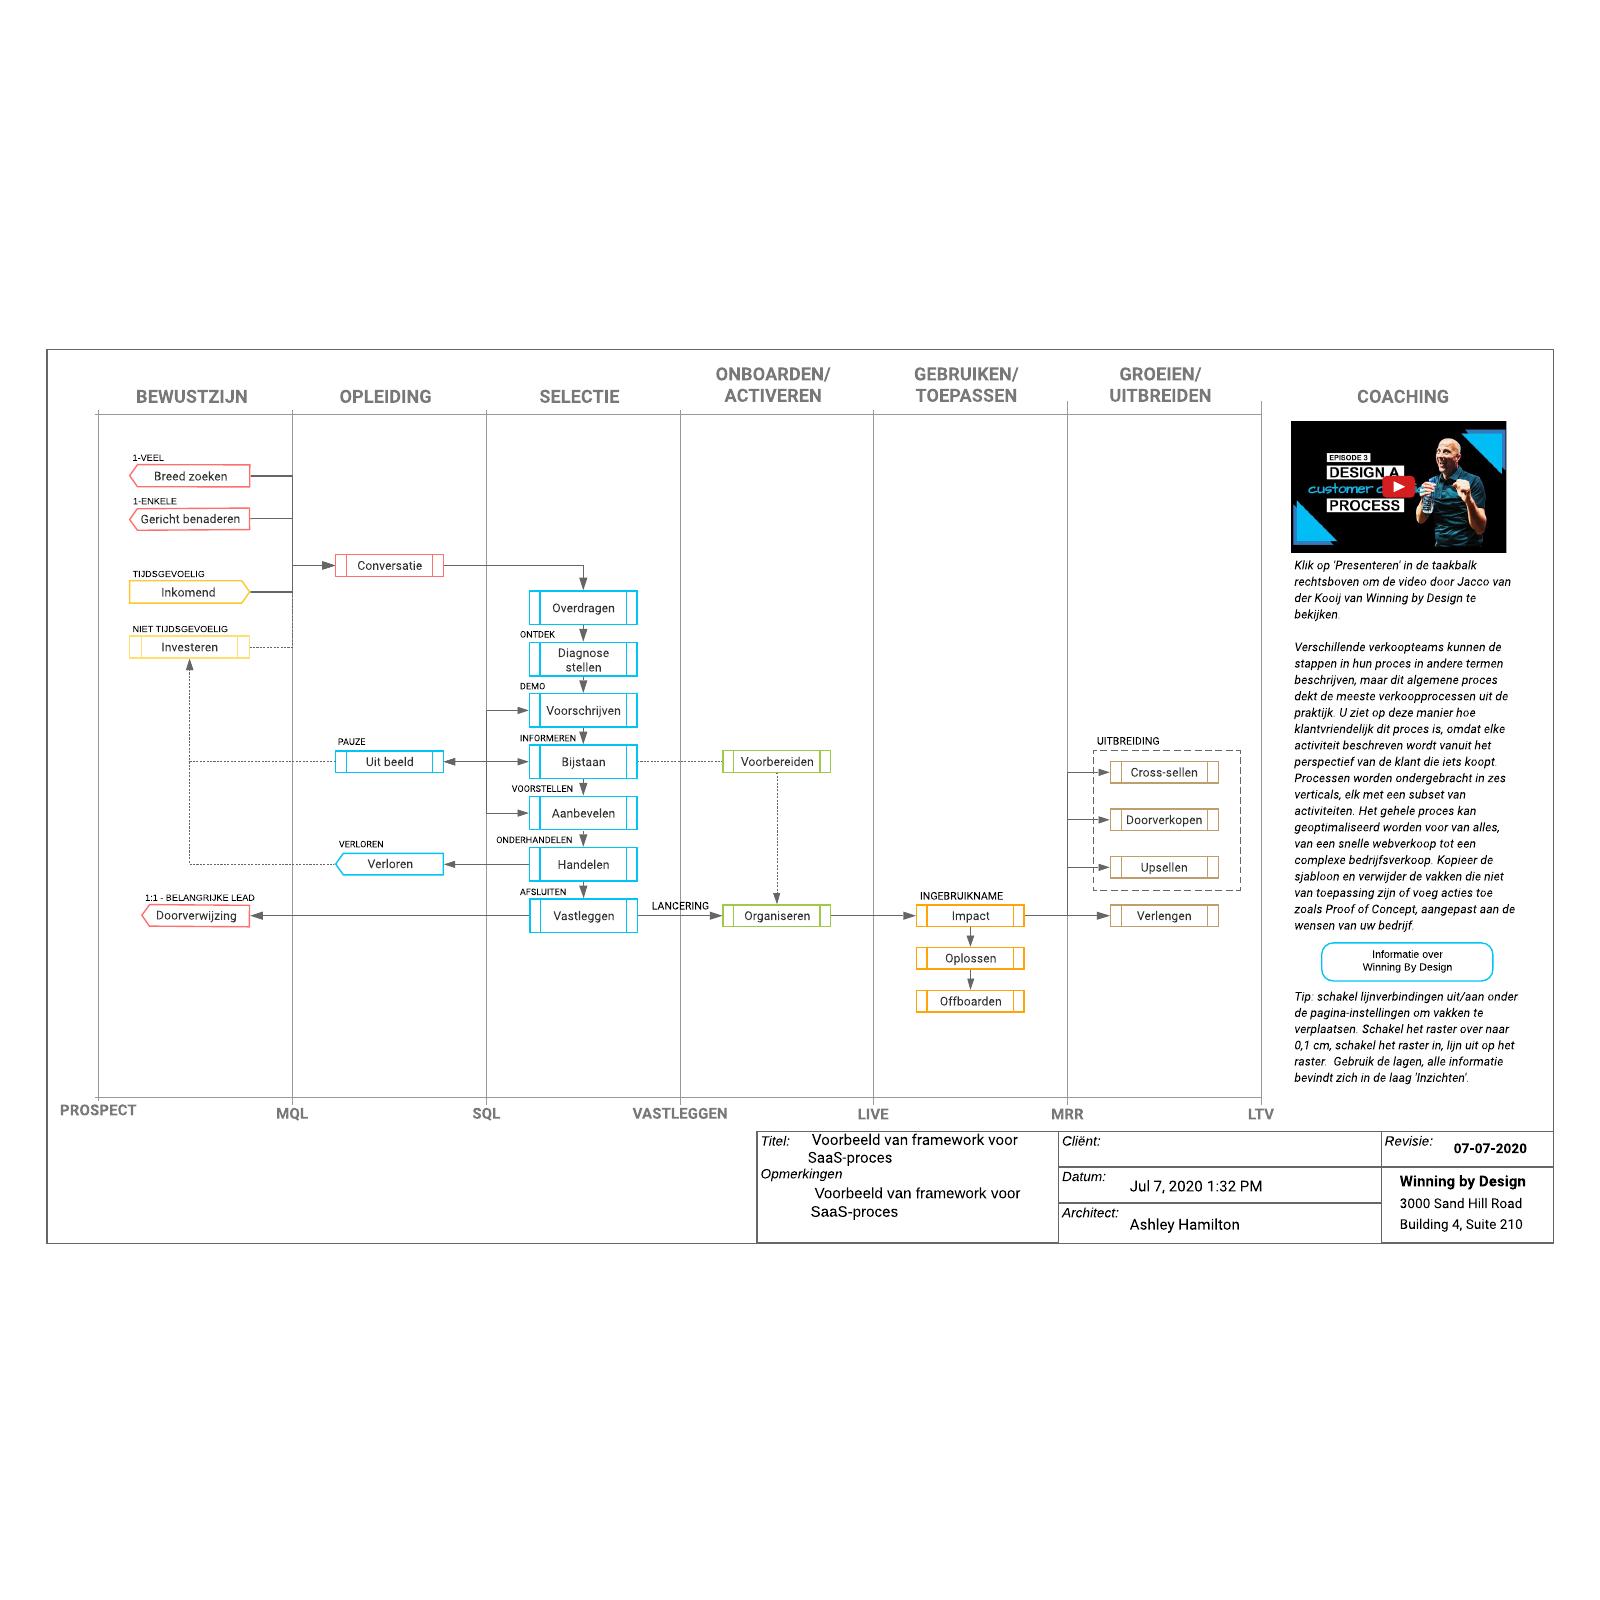 Voorbeeld van framework voor SaaS-proces